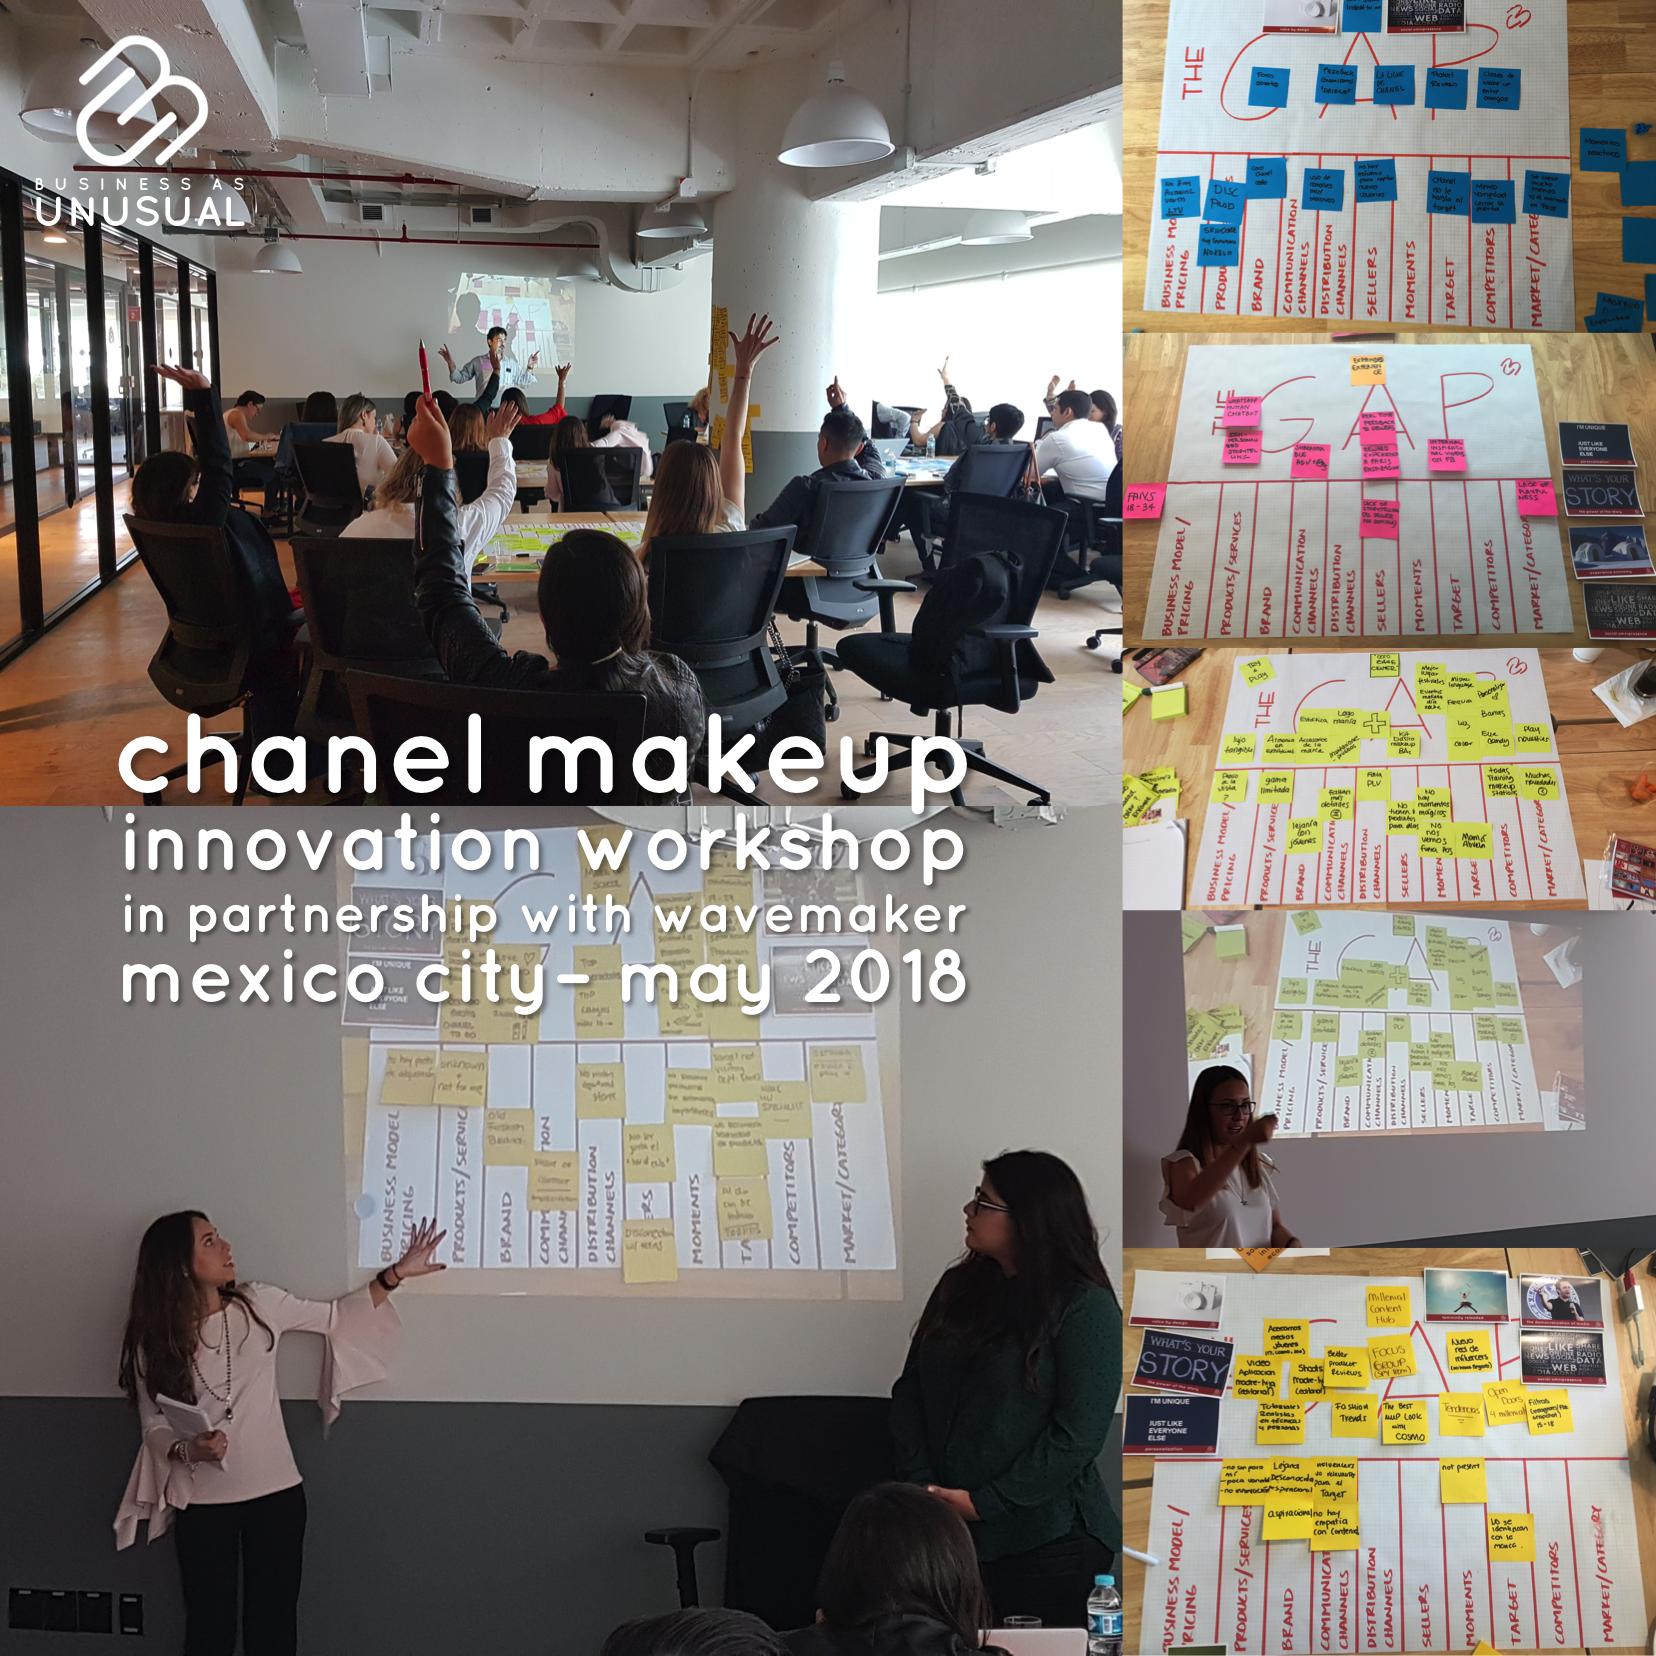 CHANEL MakeUp - Ideation, Innovation, Problem-Solving & Marketing Plan